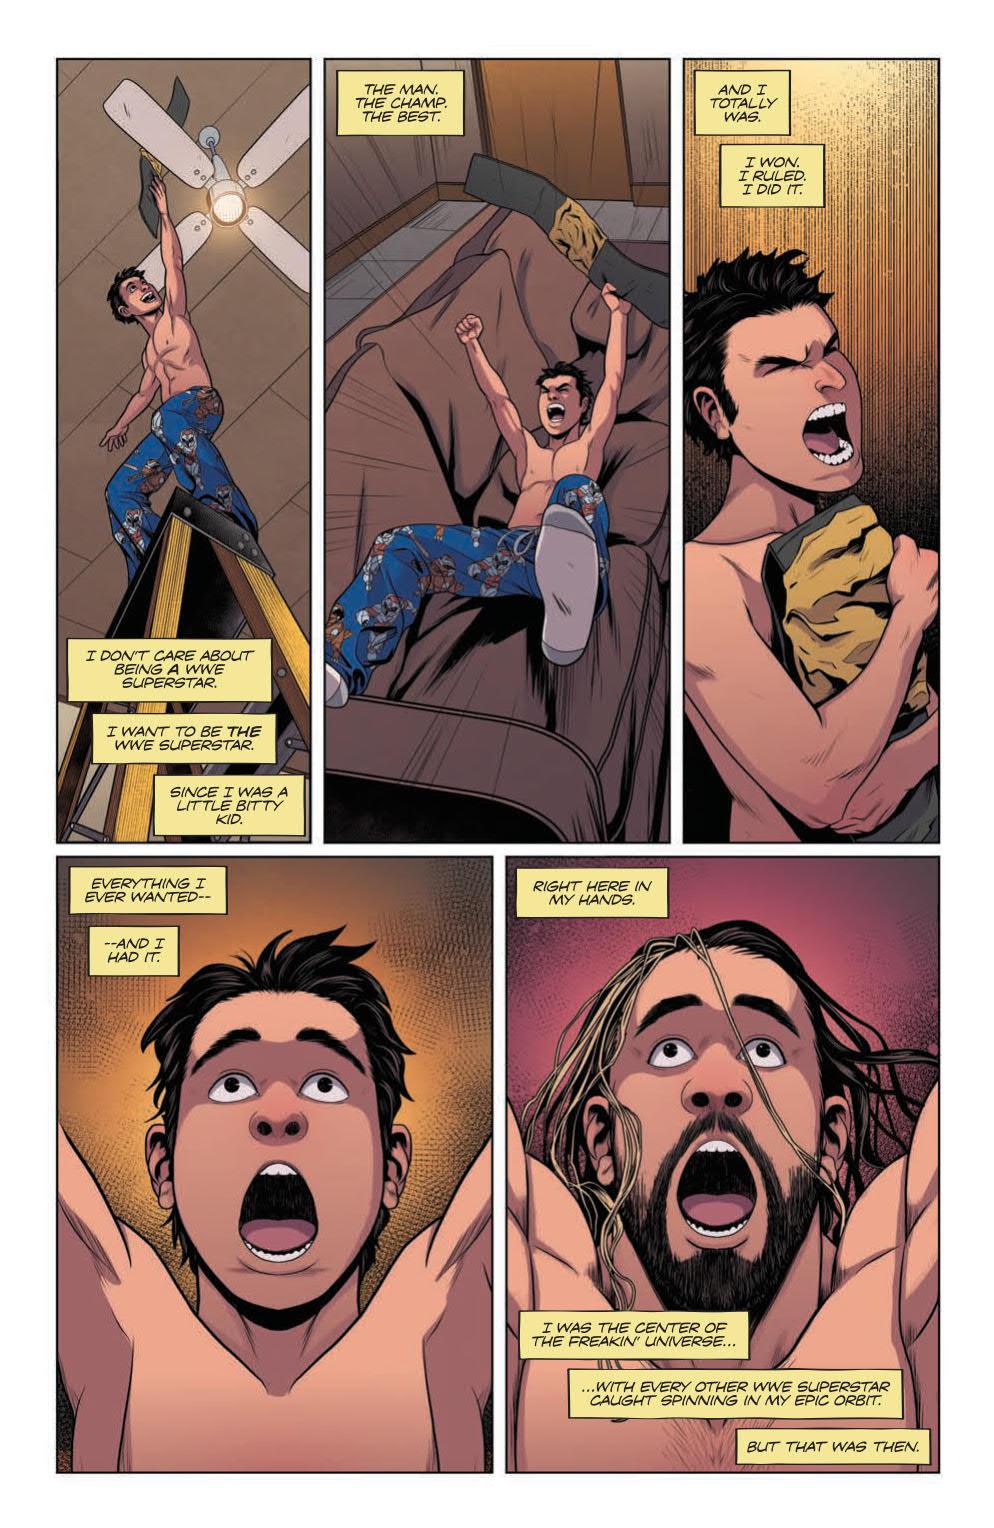 WWE_003_PRESS_4 ComicList Preview: WWE #3